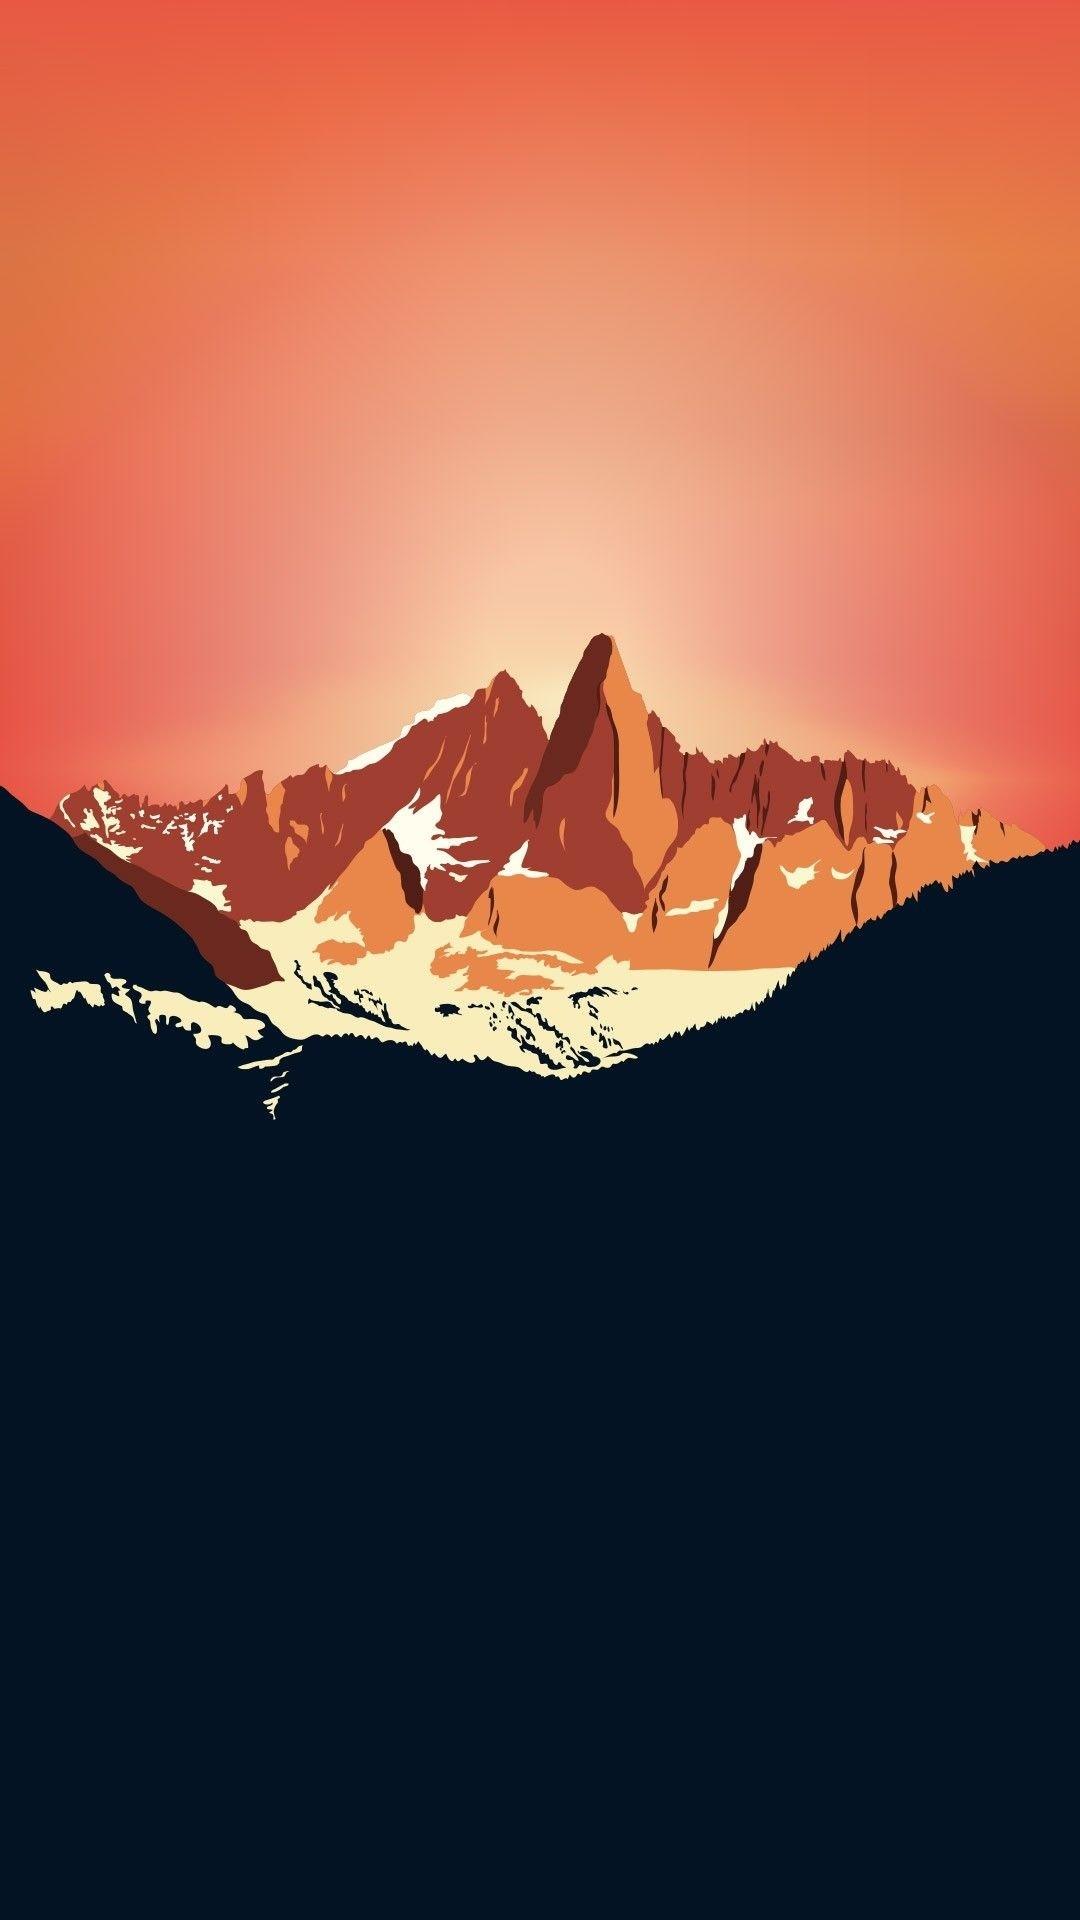 Minimalist iPhone 6 wallpaper